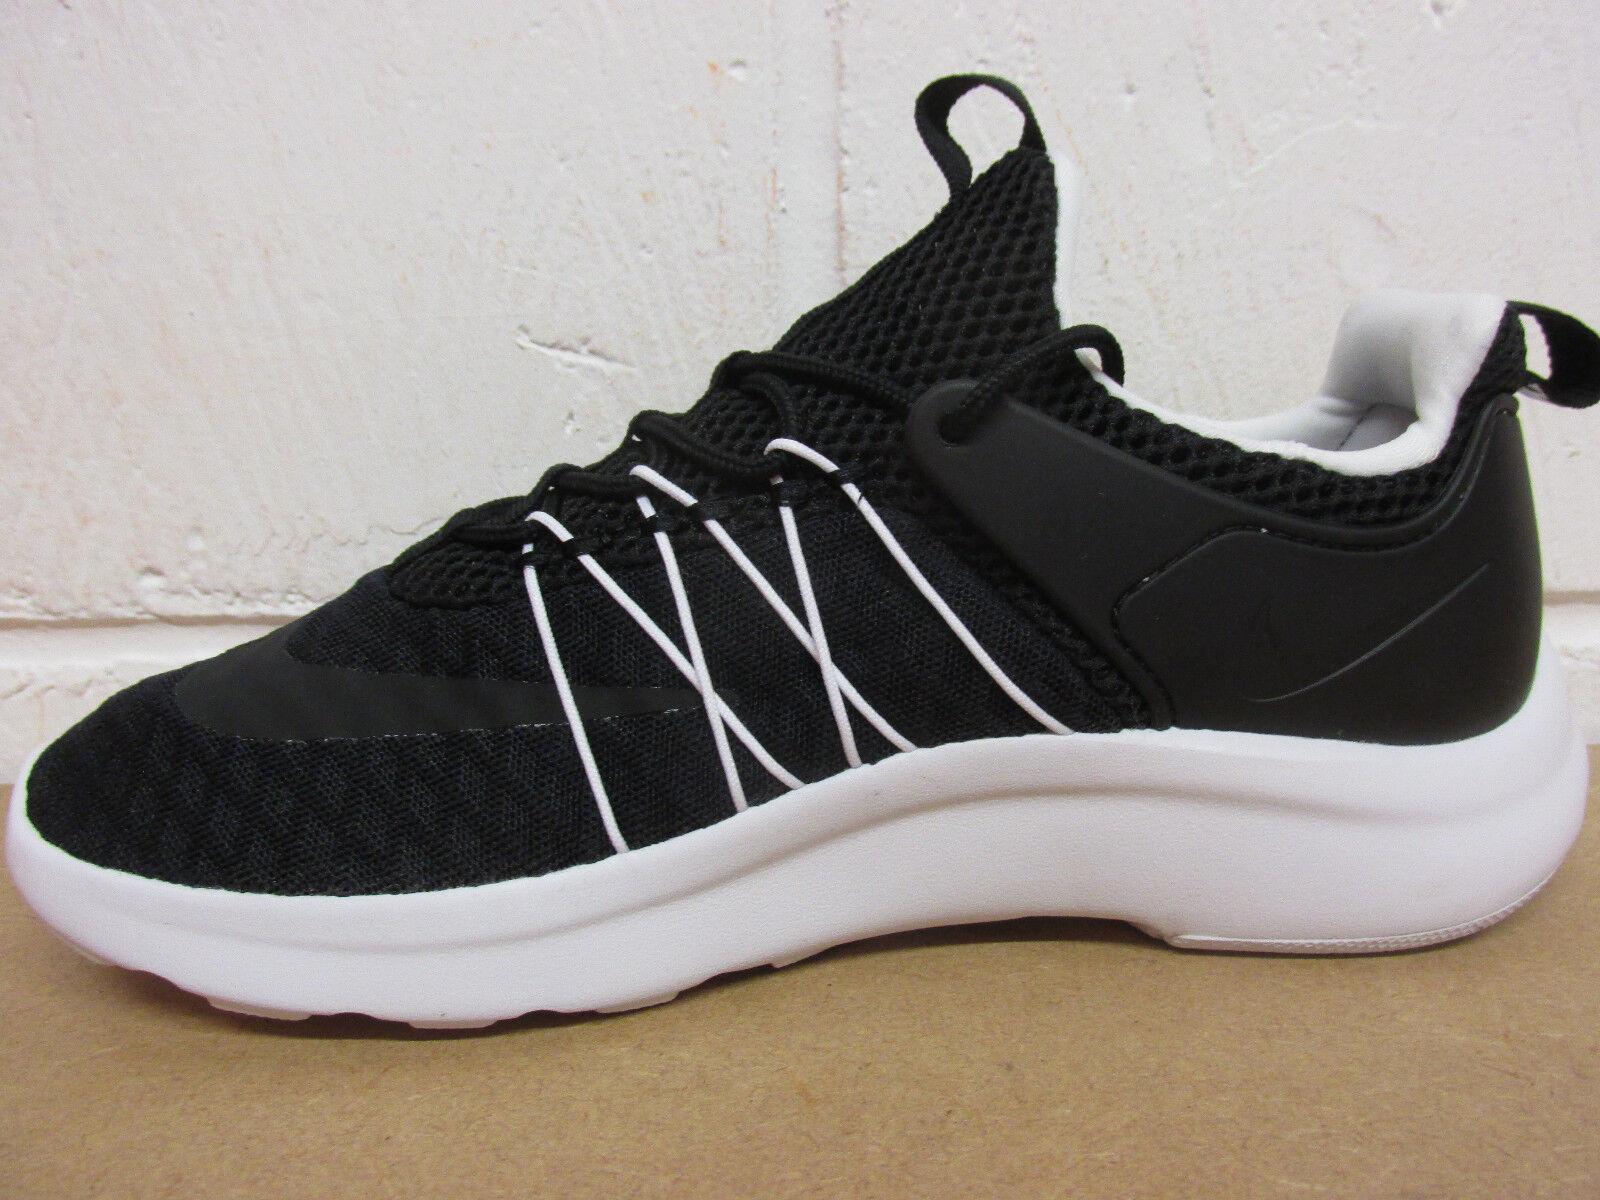 Nike Femme Darwin 003 Running Baskets 819959 003 Darwin Baskets Chaussures 0a1f9f